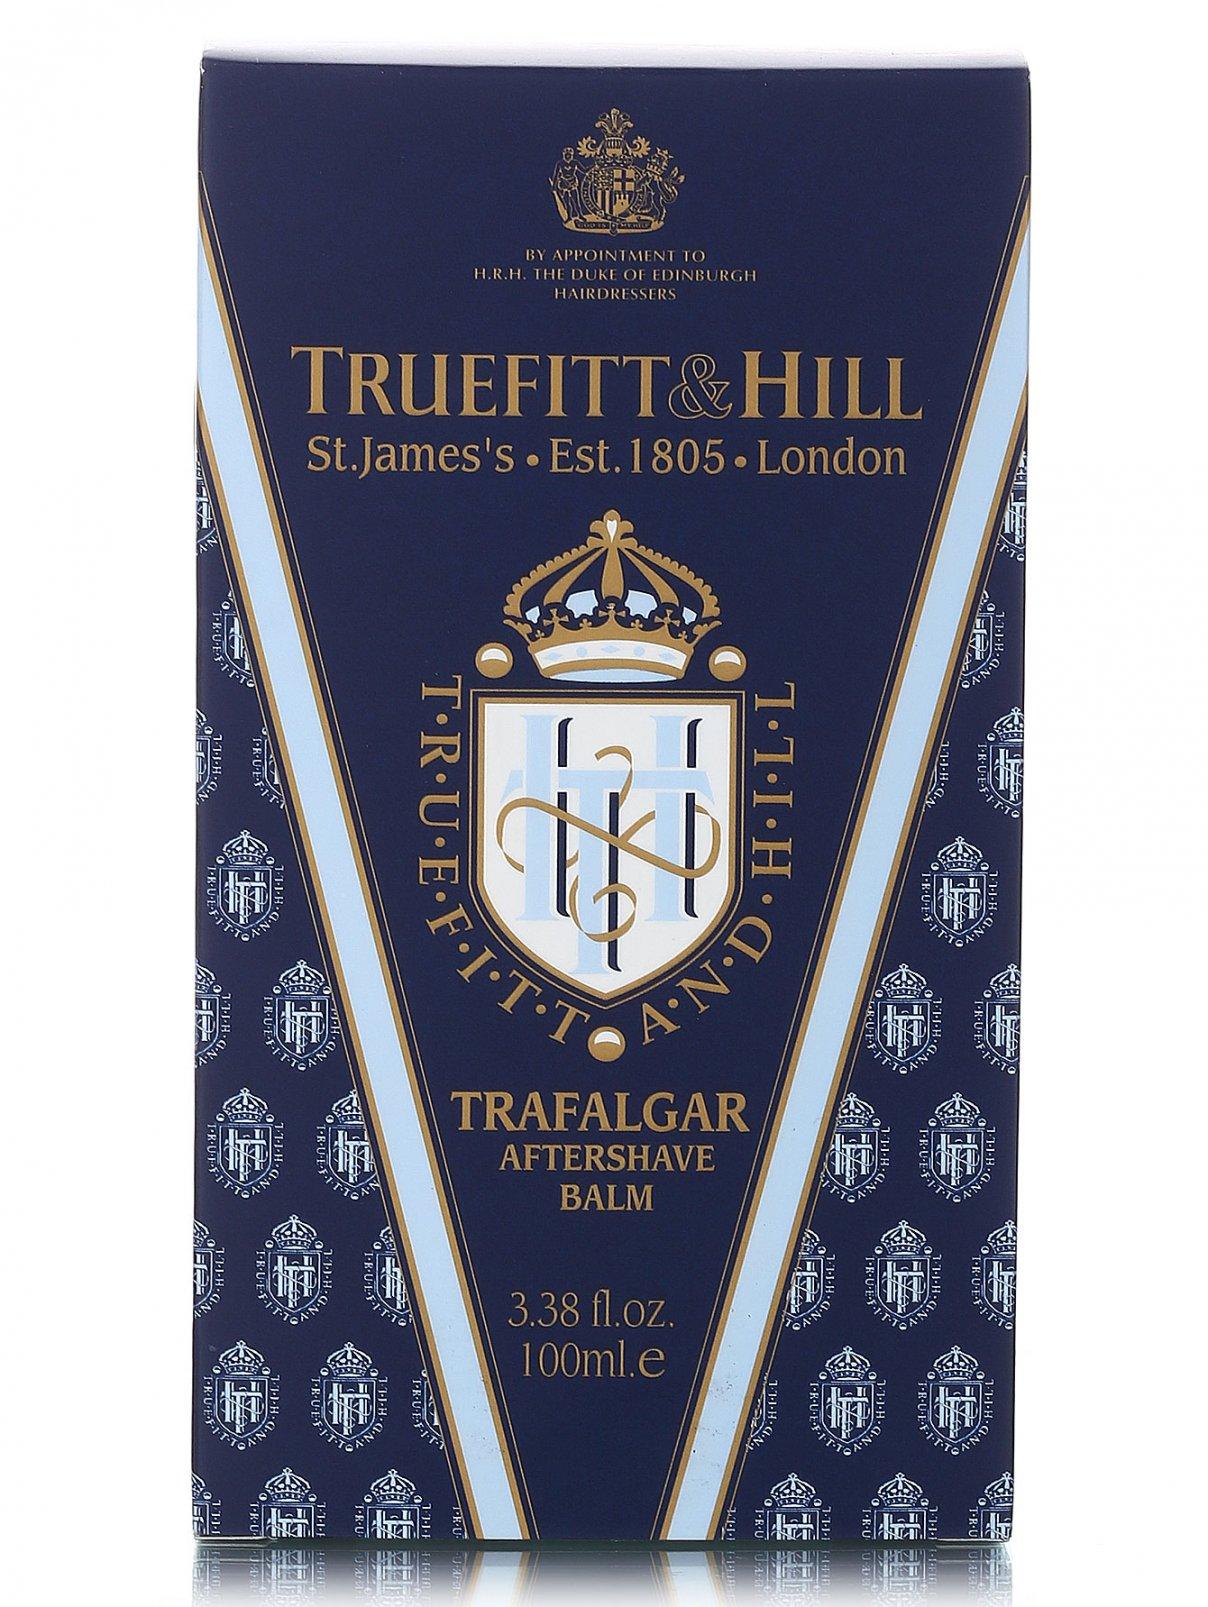 Бальзам после бритья - Trafalgar aftershave balm, 100ml Truefitt & Hill  –  Модель Общий вид